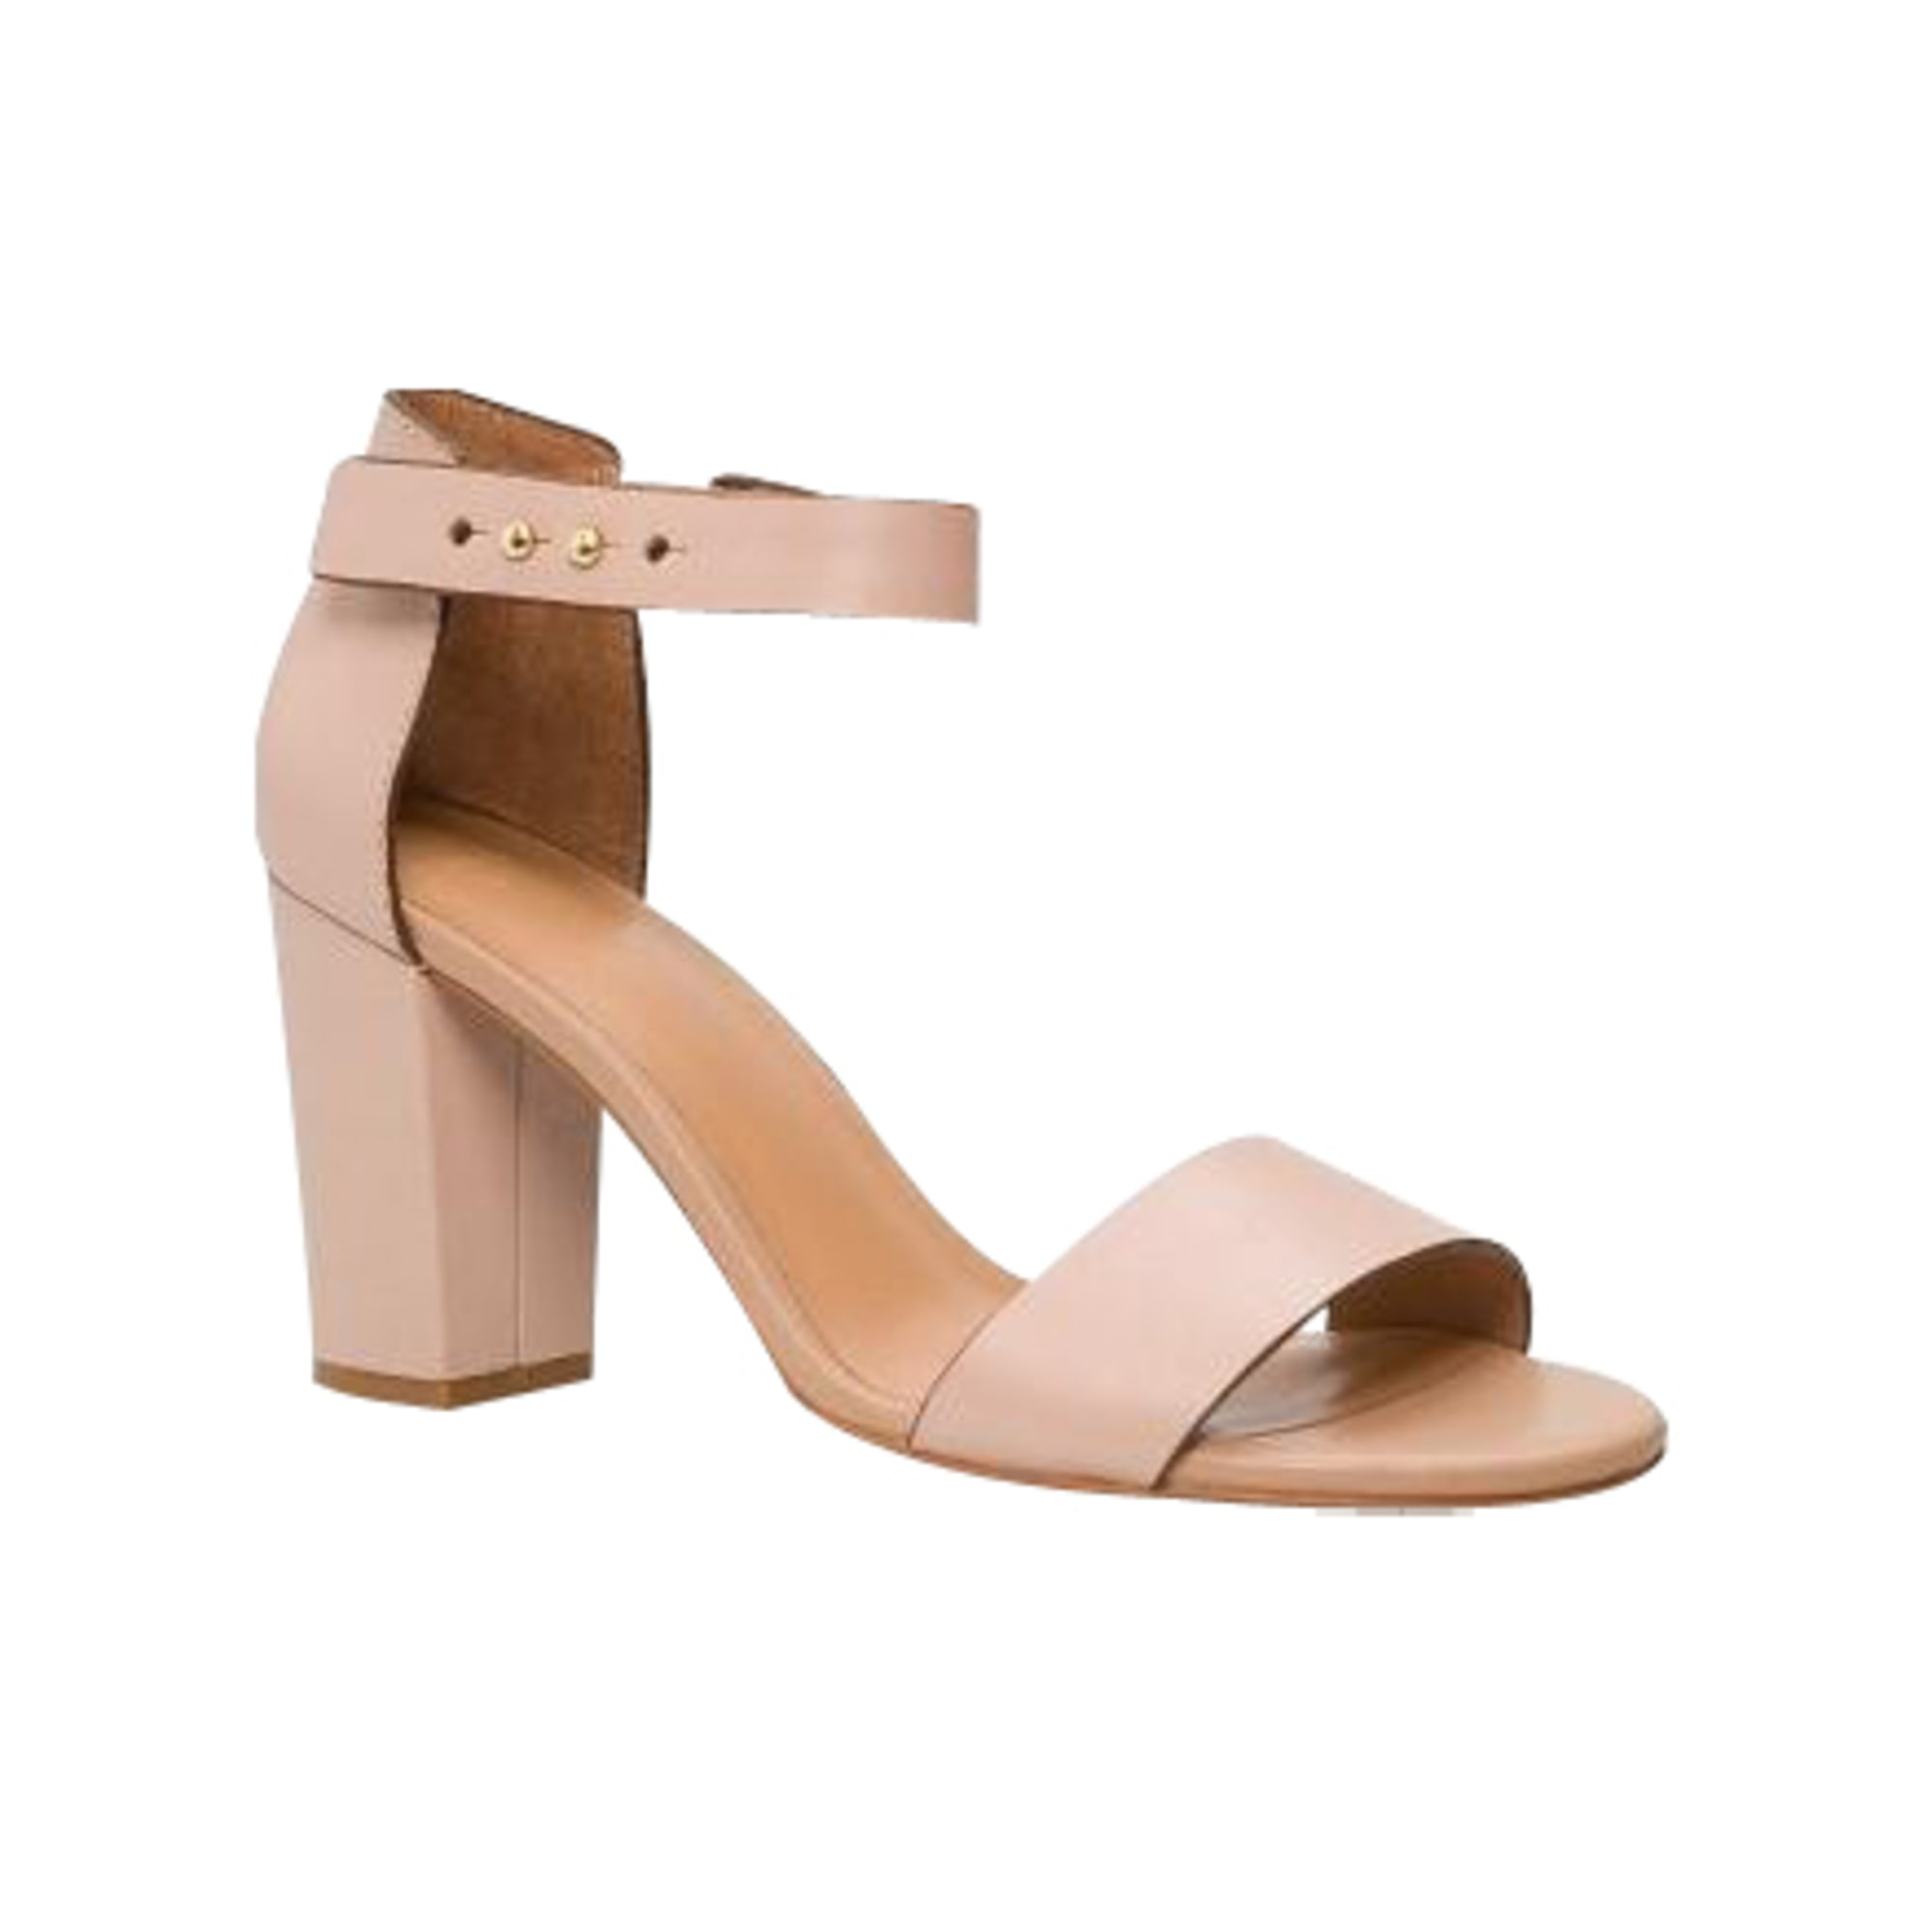 973f3d8234a Heeled Sandals MANGO 37 pink vendu par Princess soumaya23439 ...